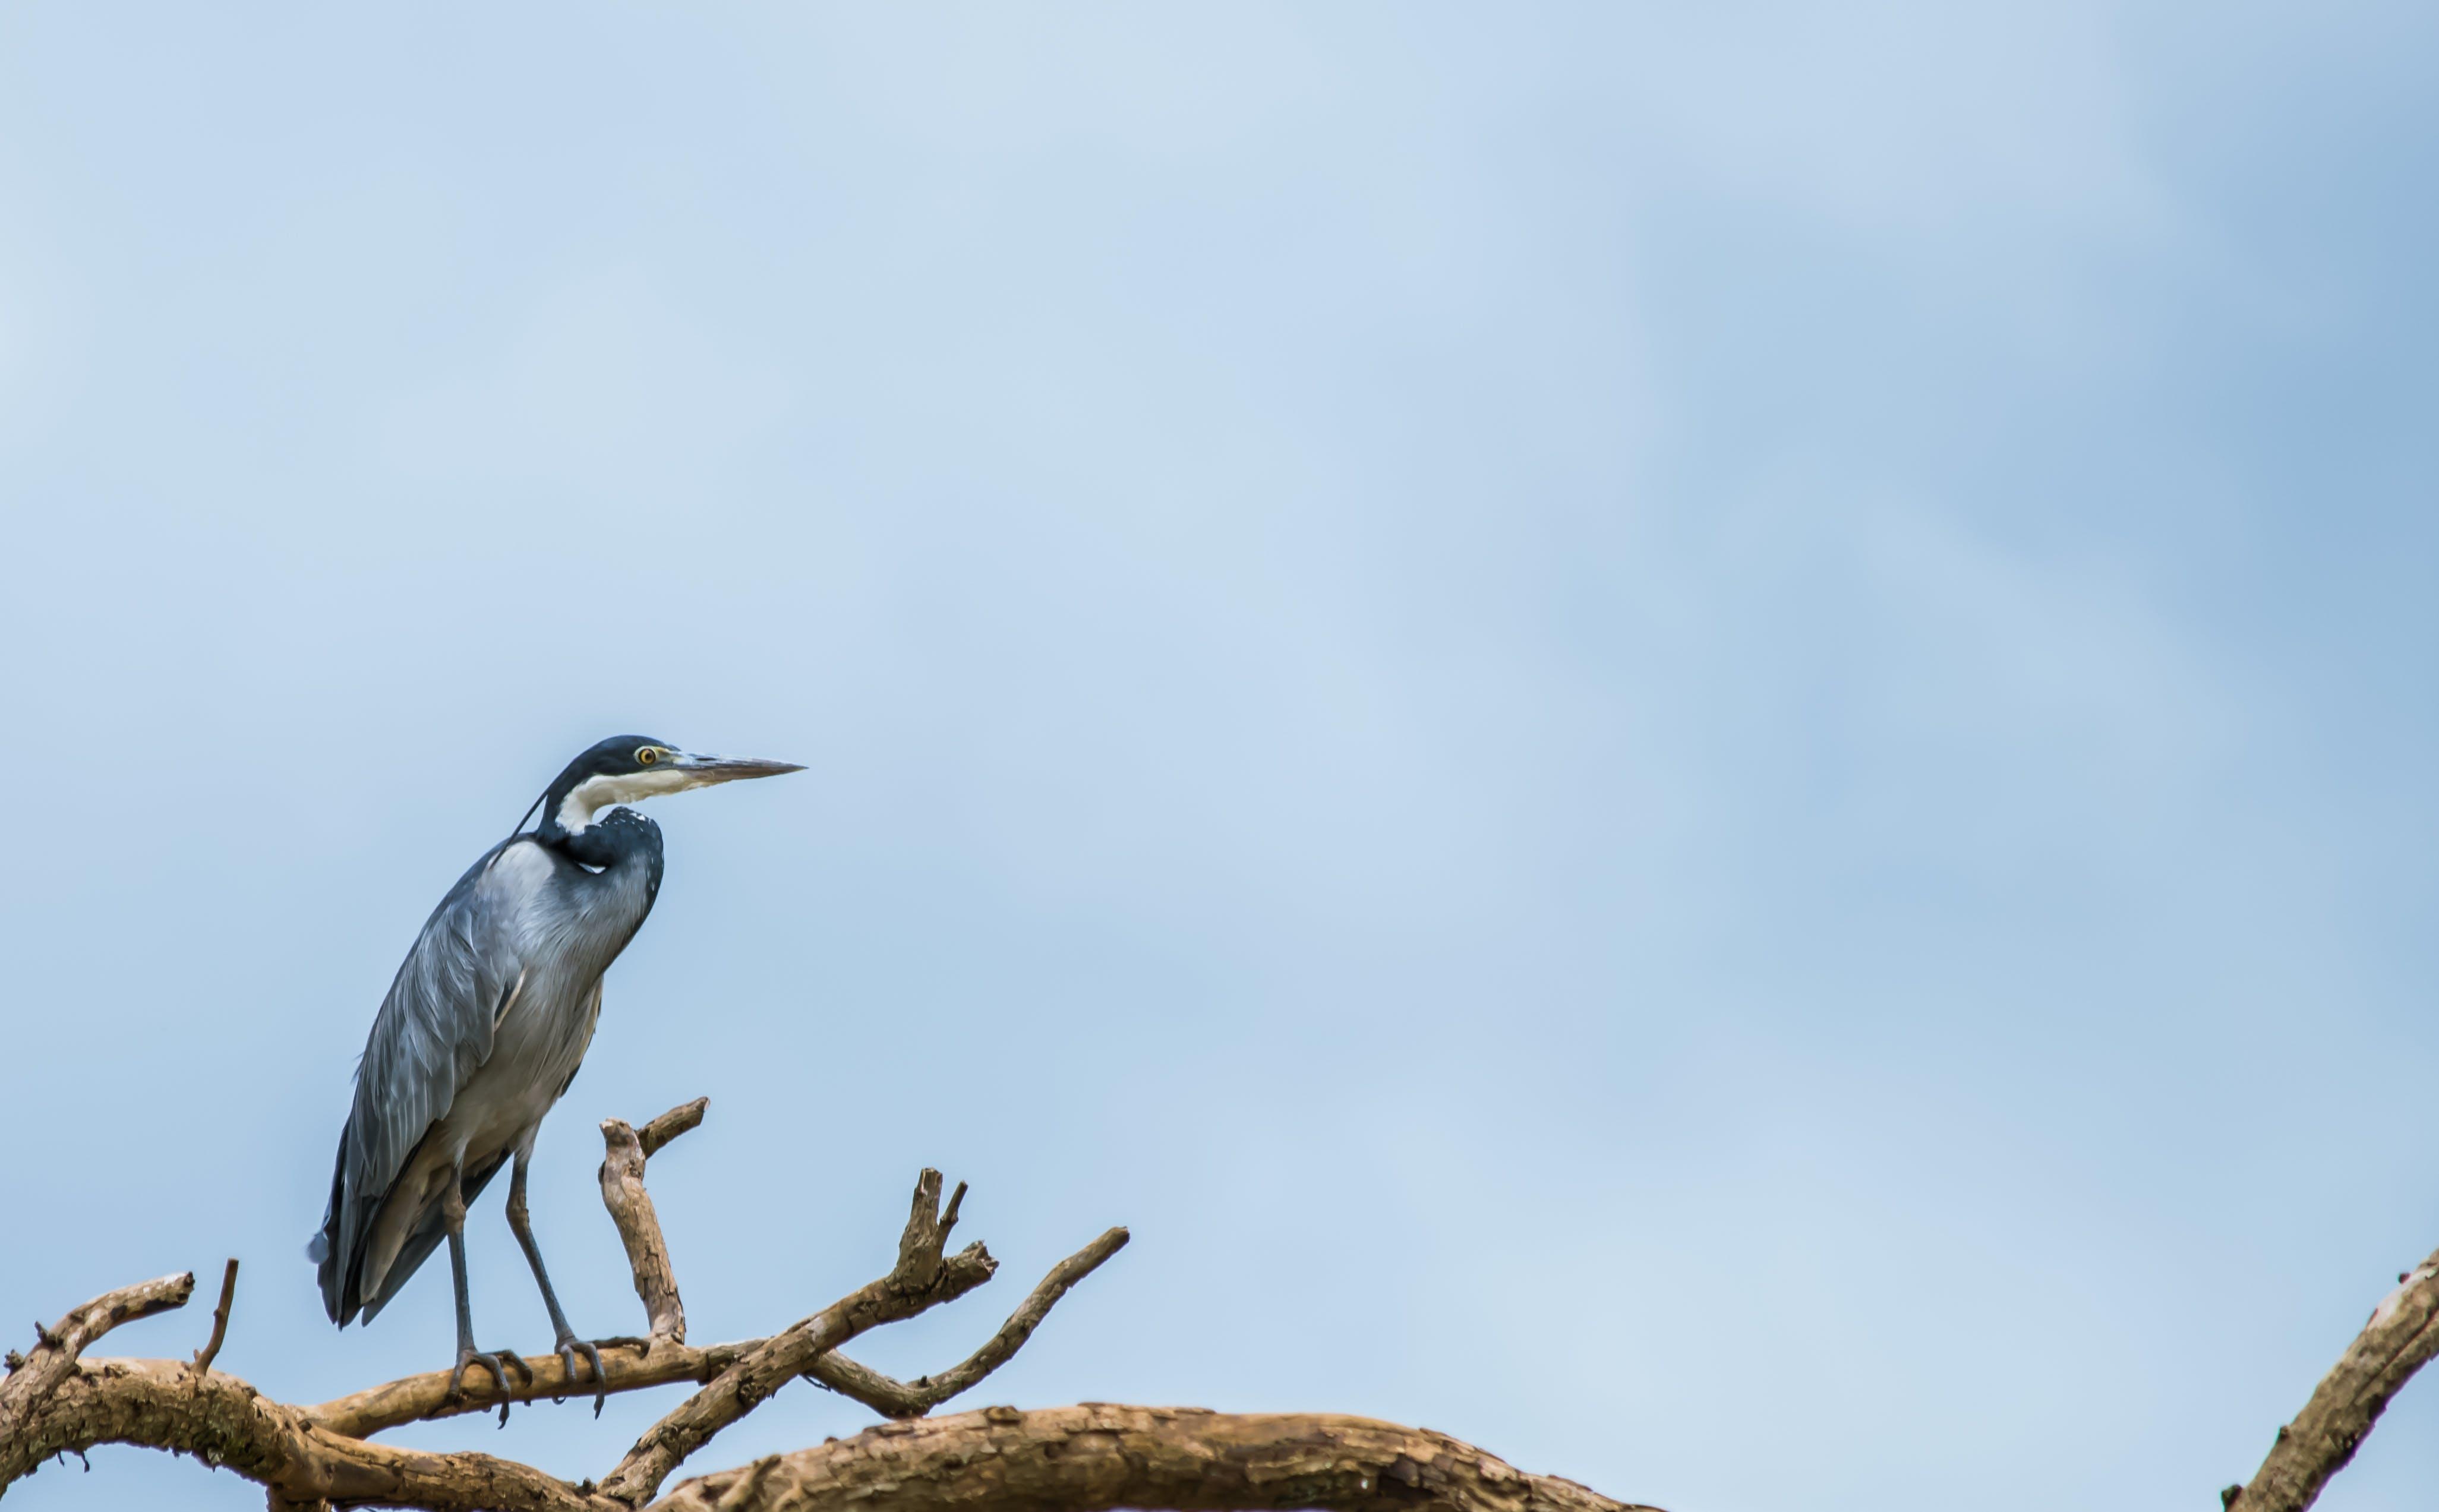 Free stock photo of Blue heron